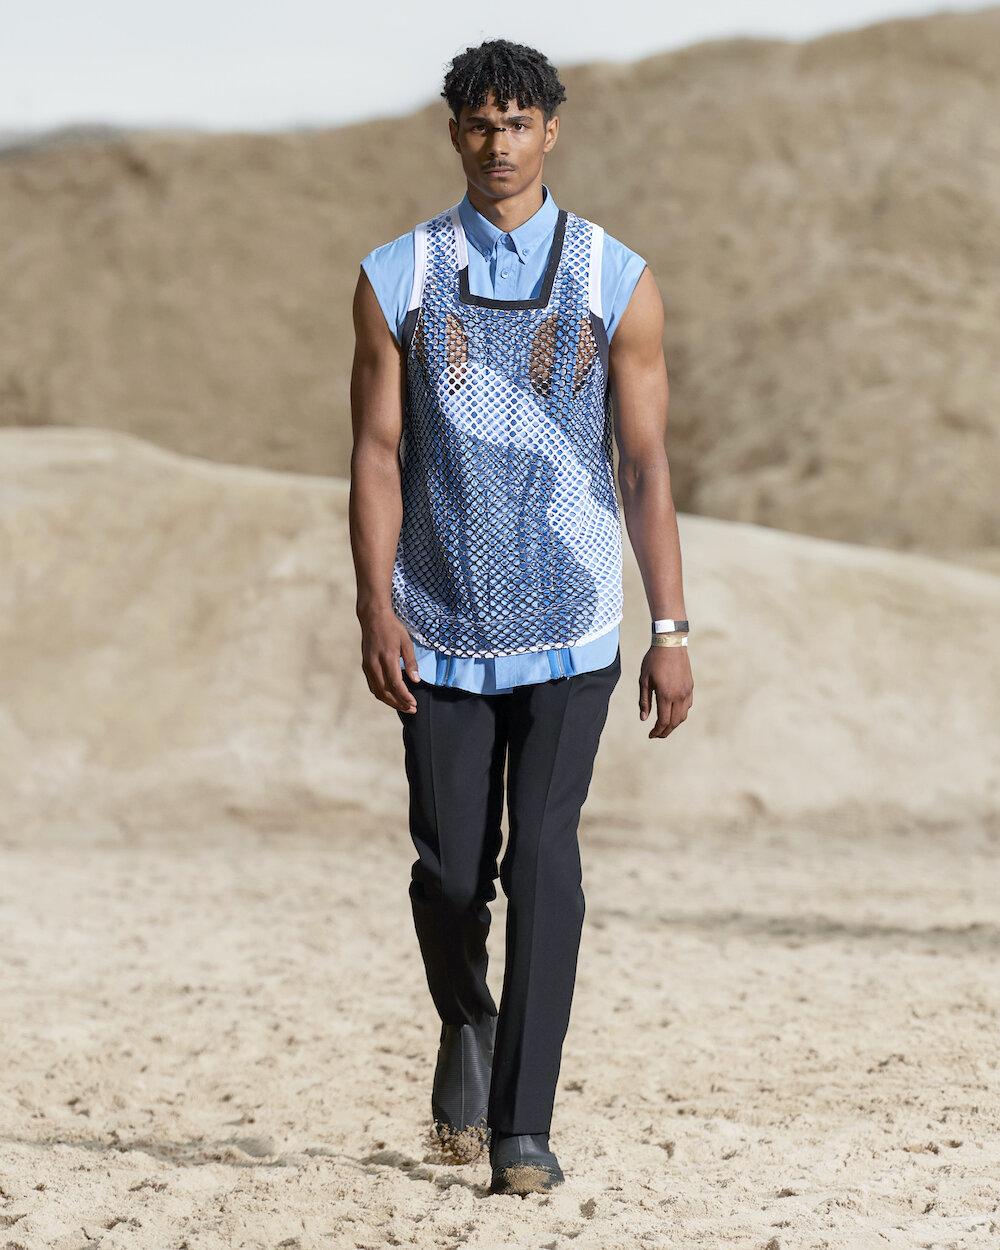 Burberry Spring_Summer 2022 Menswear Presentation Collection - Look 42 - Jayden.jpg